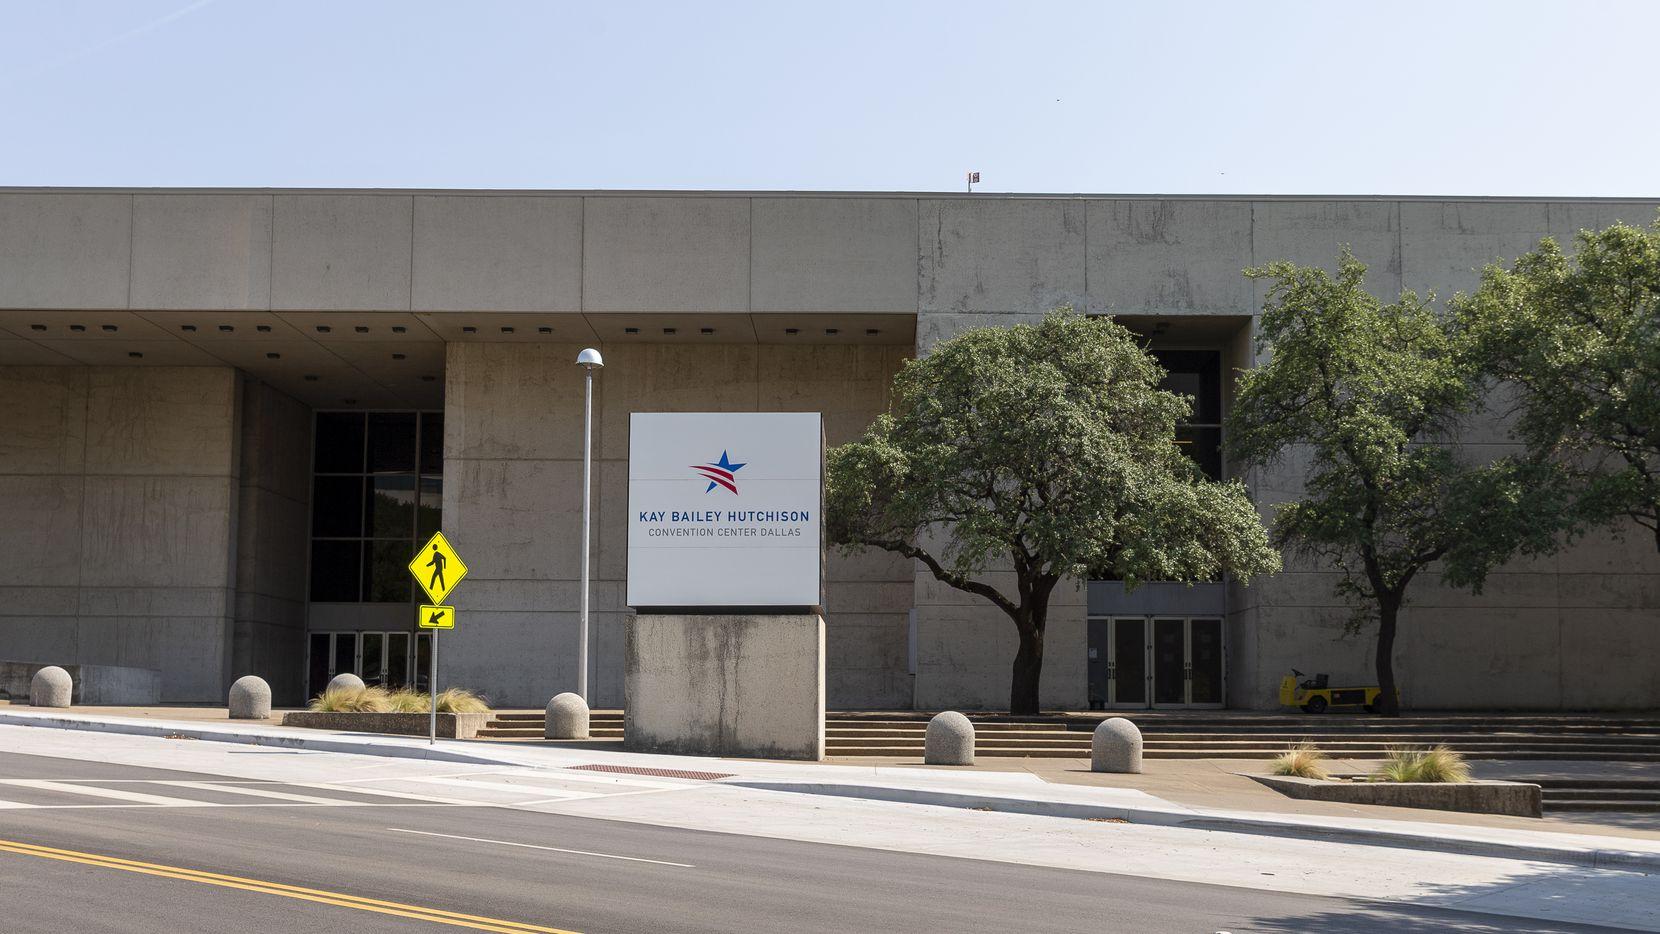 The Kay Bailey Hutchison Convention Center on Thursday, Sept. 9, 2021, in Dallas. (Elias Valverde II/The Dallas Morning News)